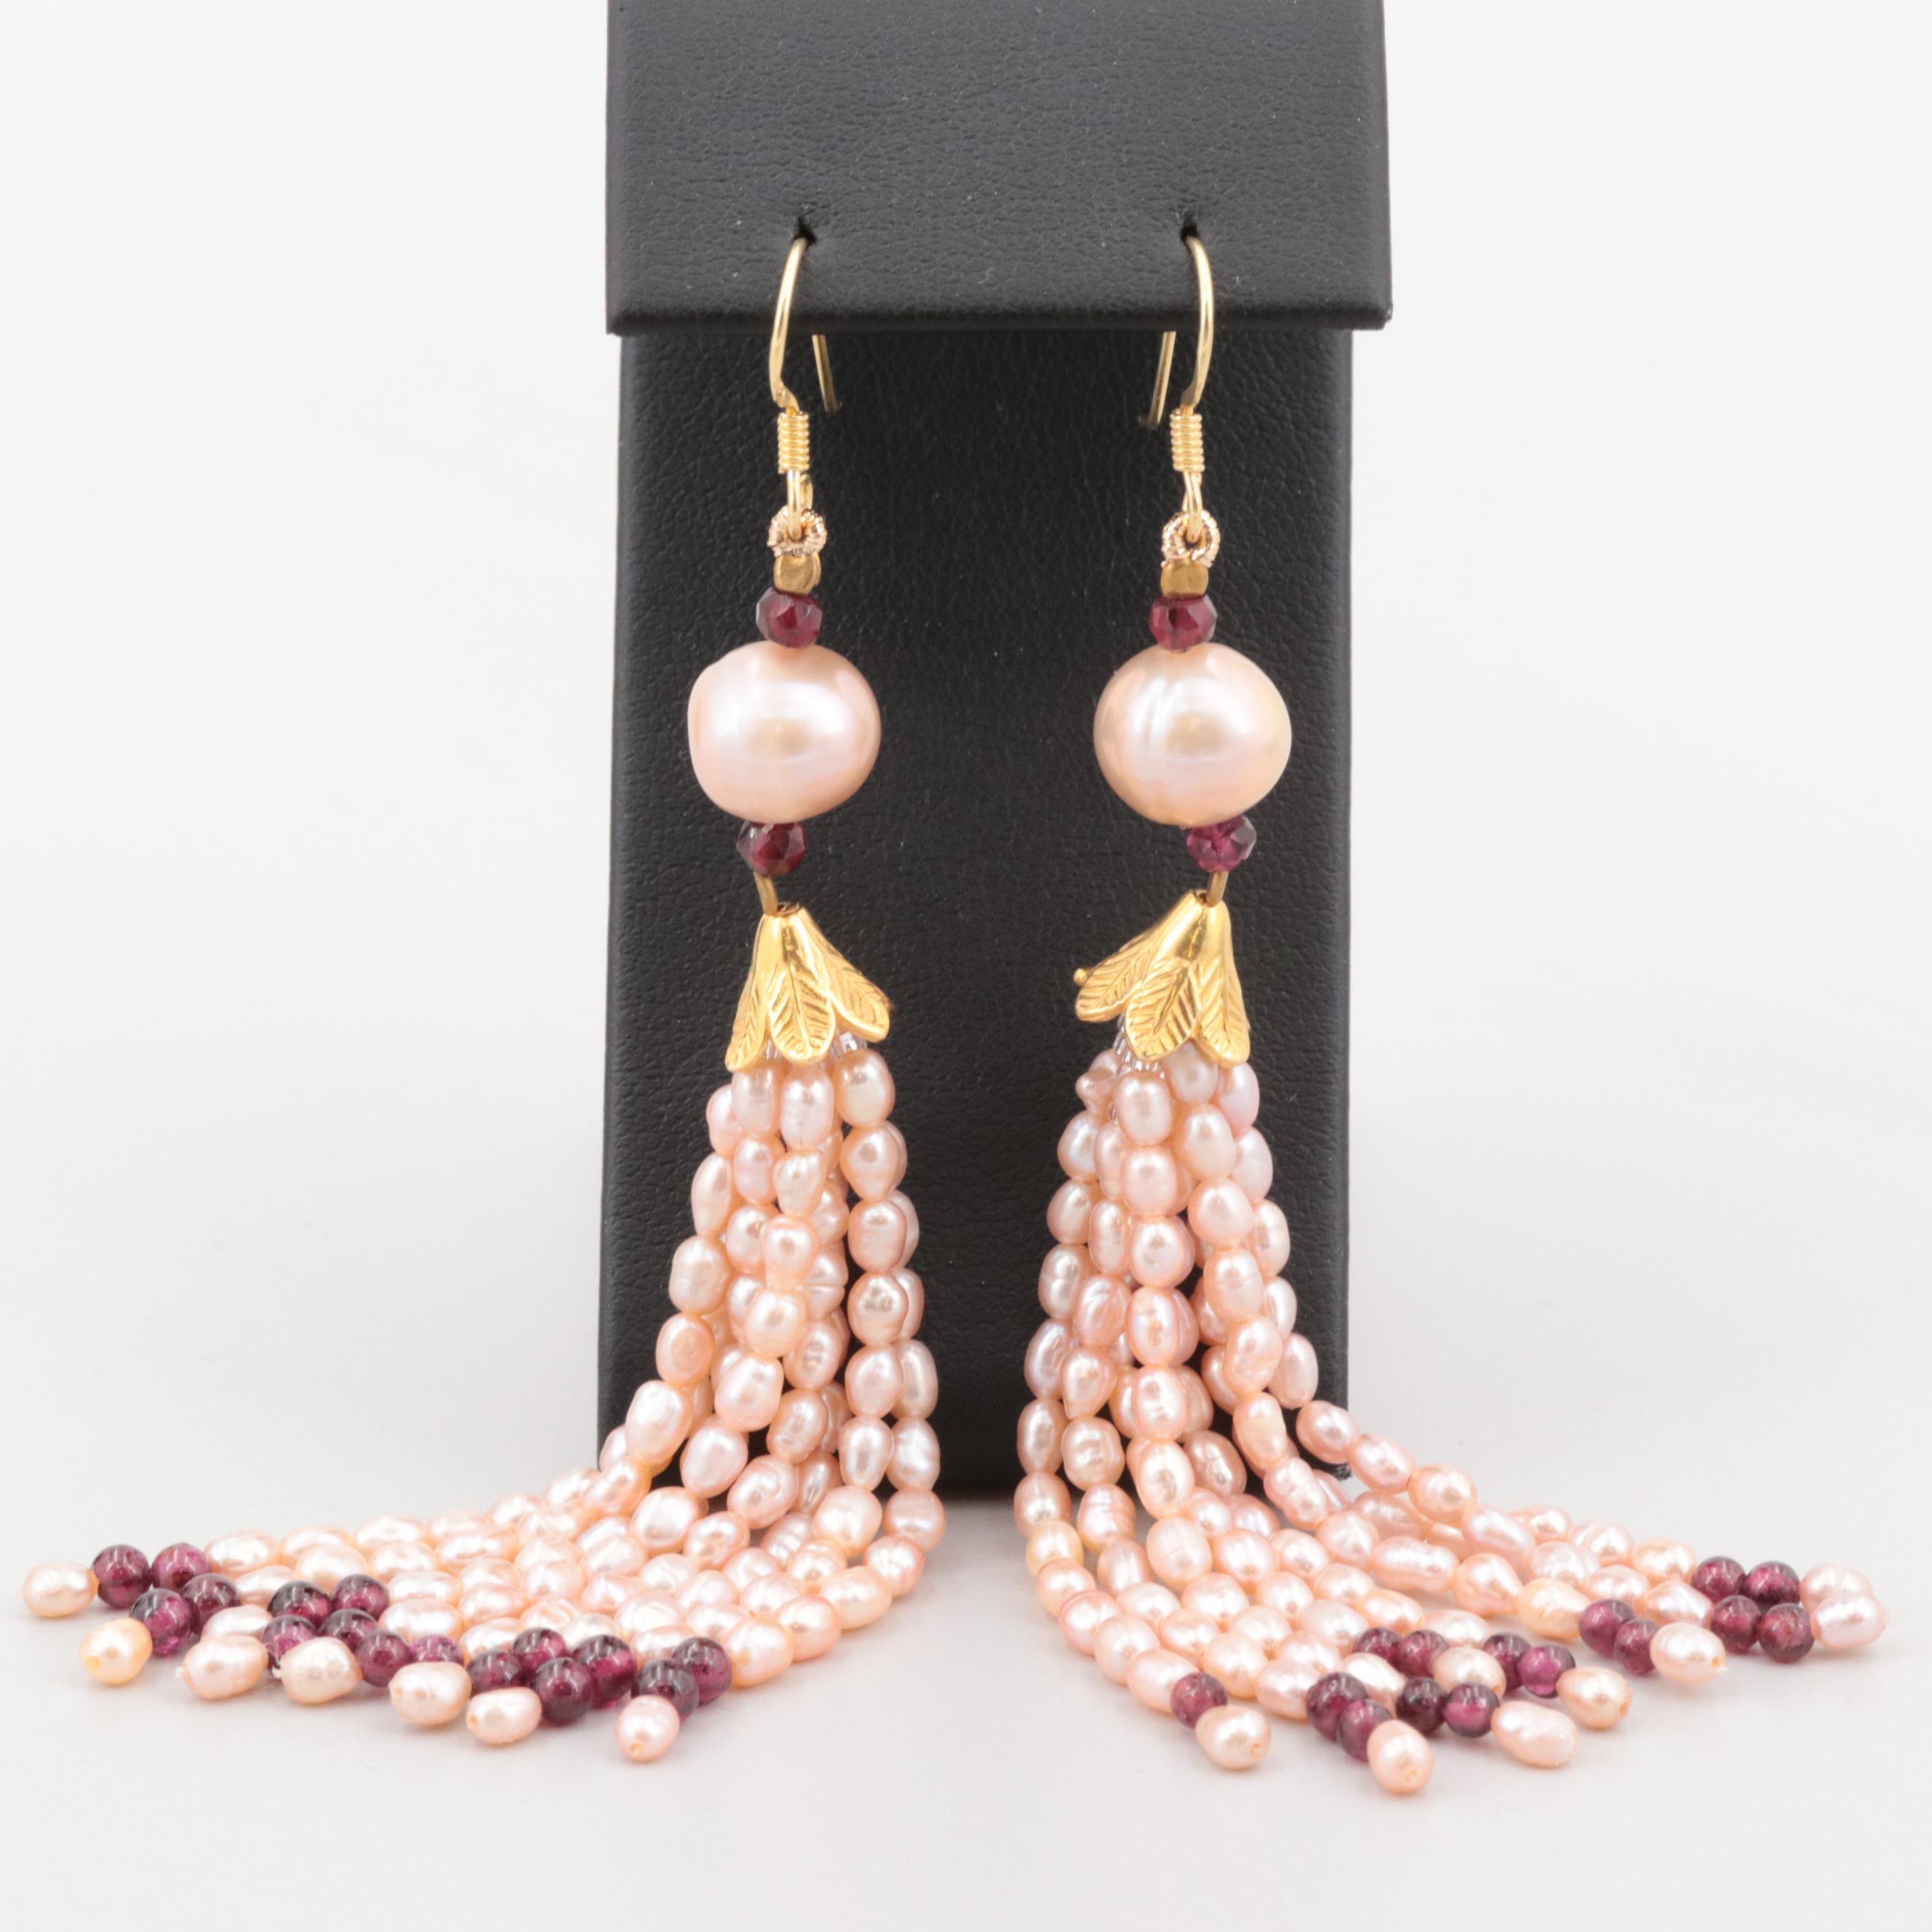 Gold Wash on Sterling Silver Cultured Pearl and Garnet Tassel Dangle Earrings